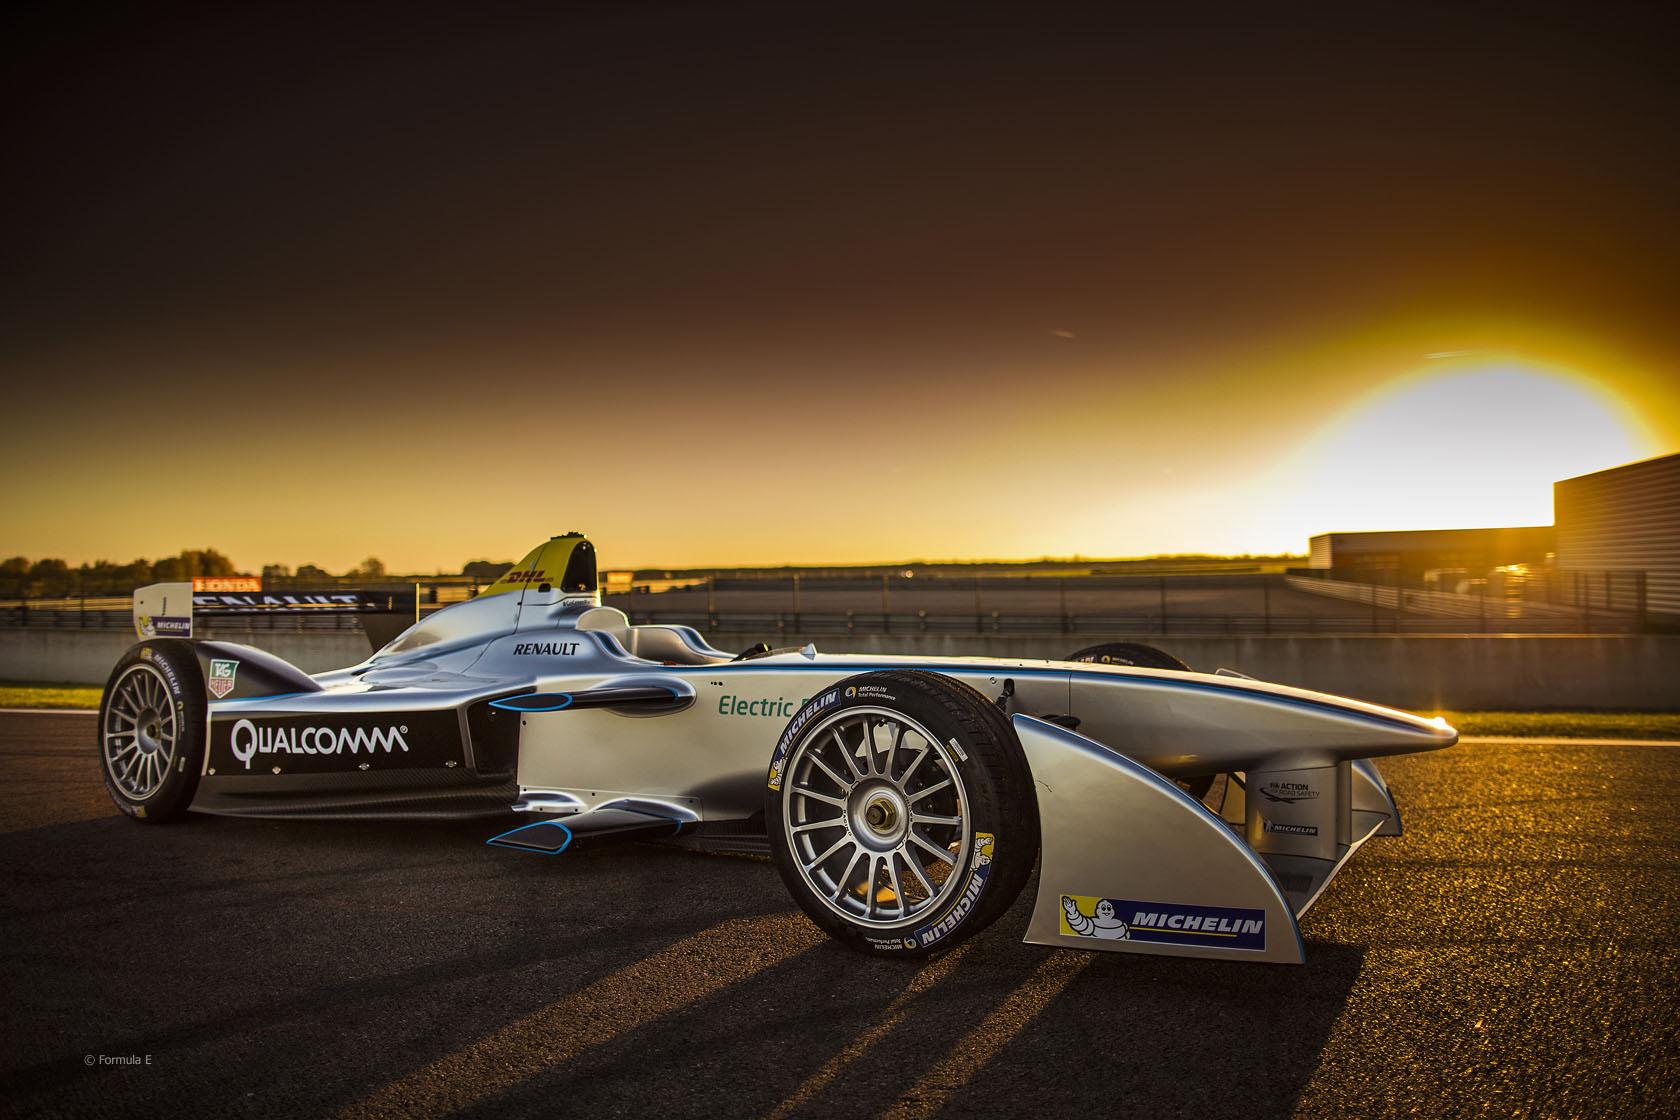 Will we see Tesla Motors in Formula E racing